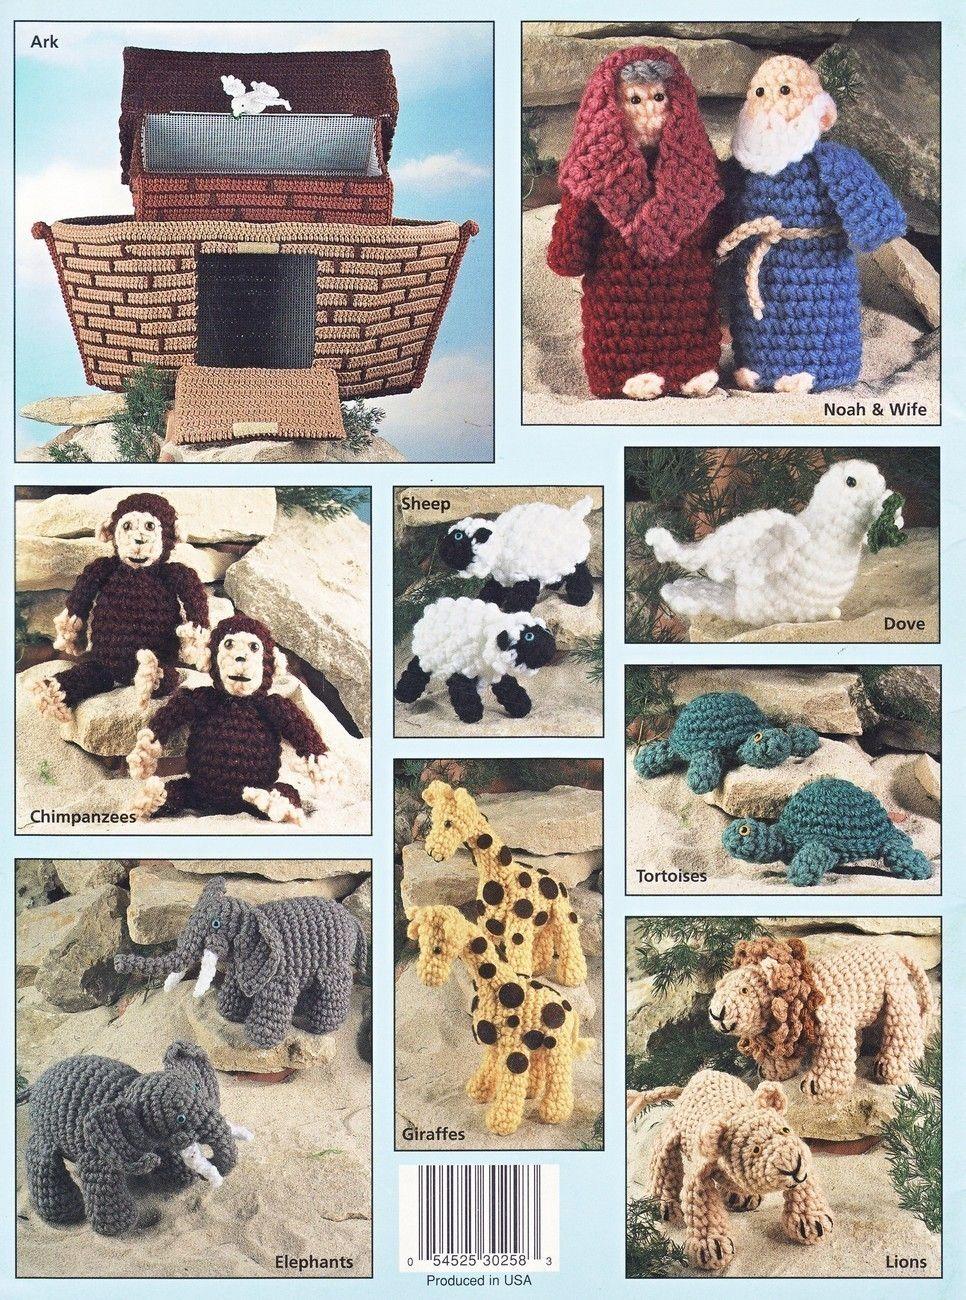 Noahs ark crochet patterns book dolls dolls toys animals house of noahs ark crochet patterns book dolls dolls toys animals house of white birches dolls bankloansurffo Image collections